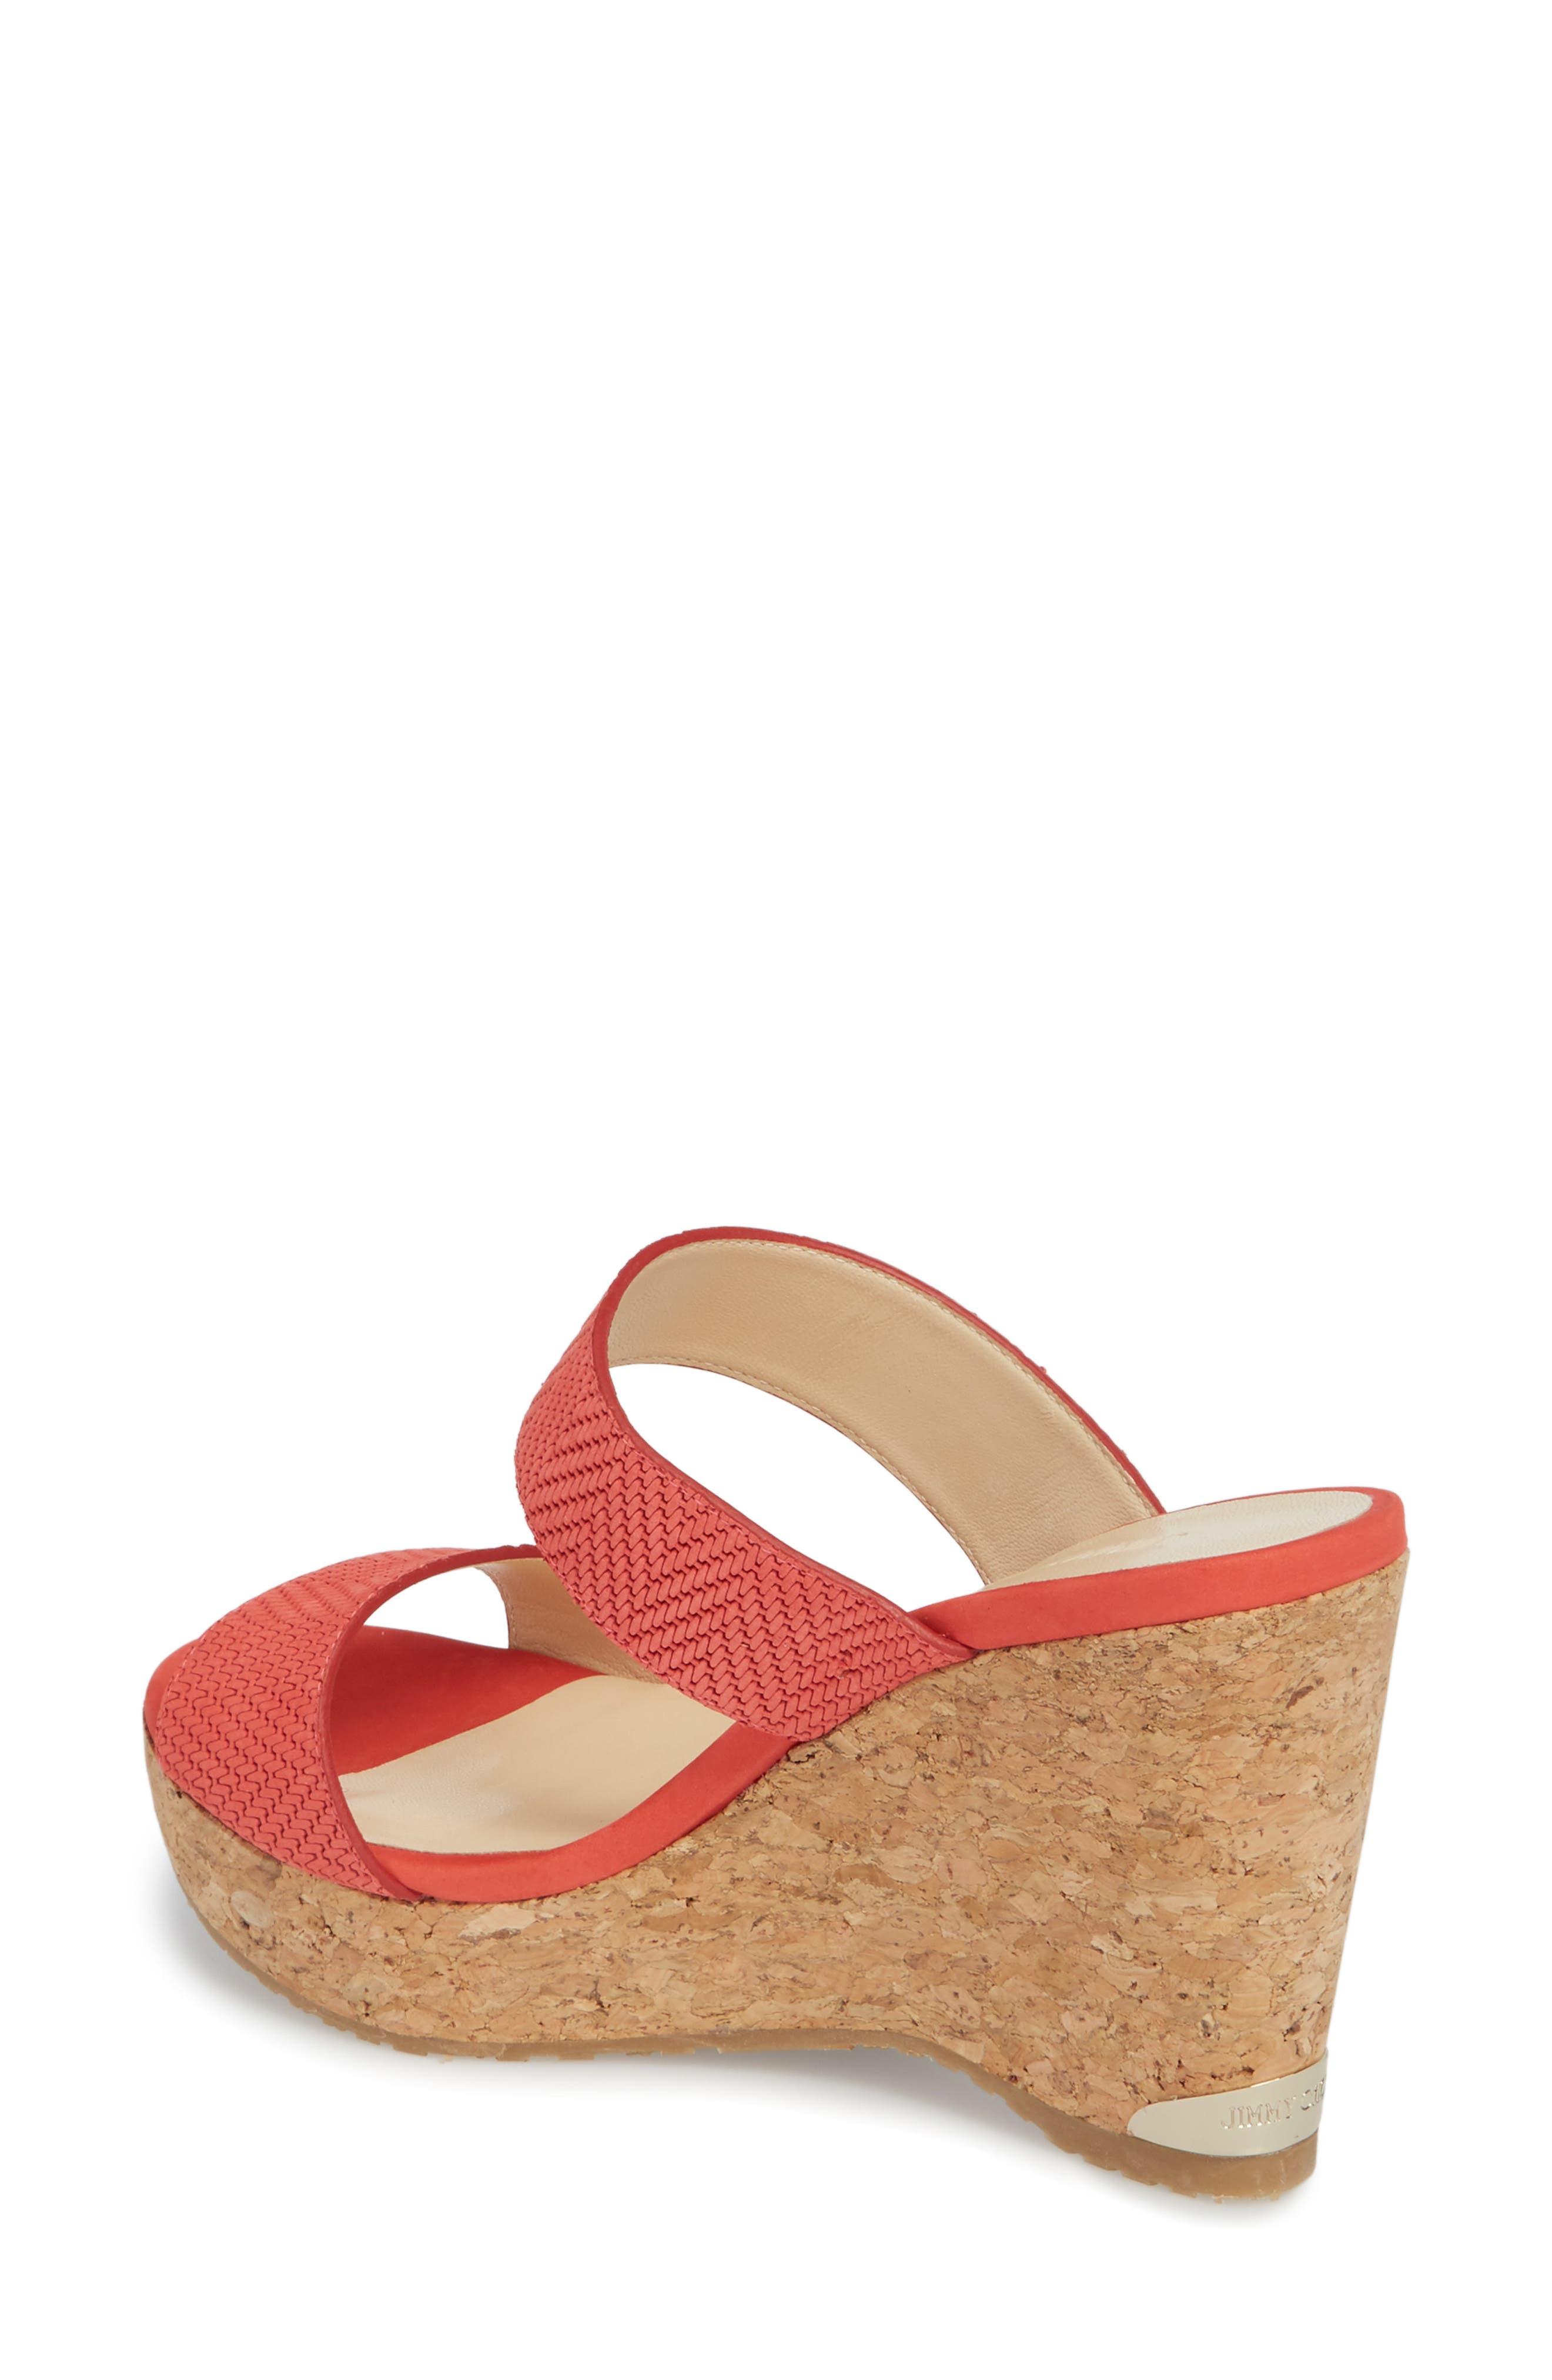 Parker Wedge Slide Sandal,                             Alternate thumbnail 2, color,                             Flamingo Red